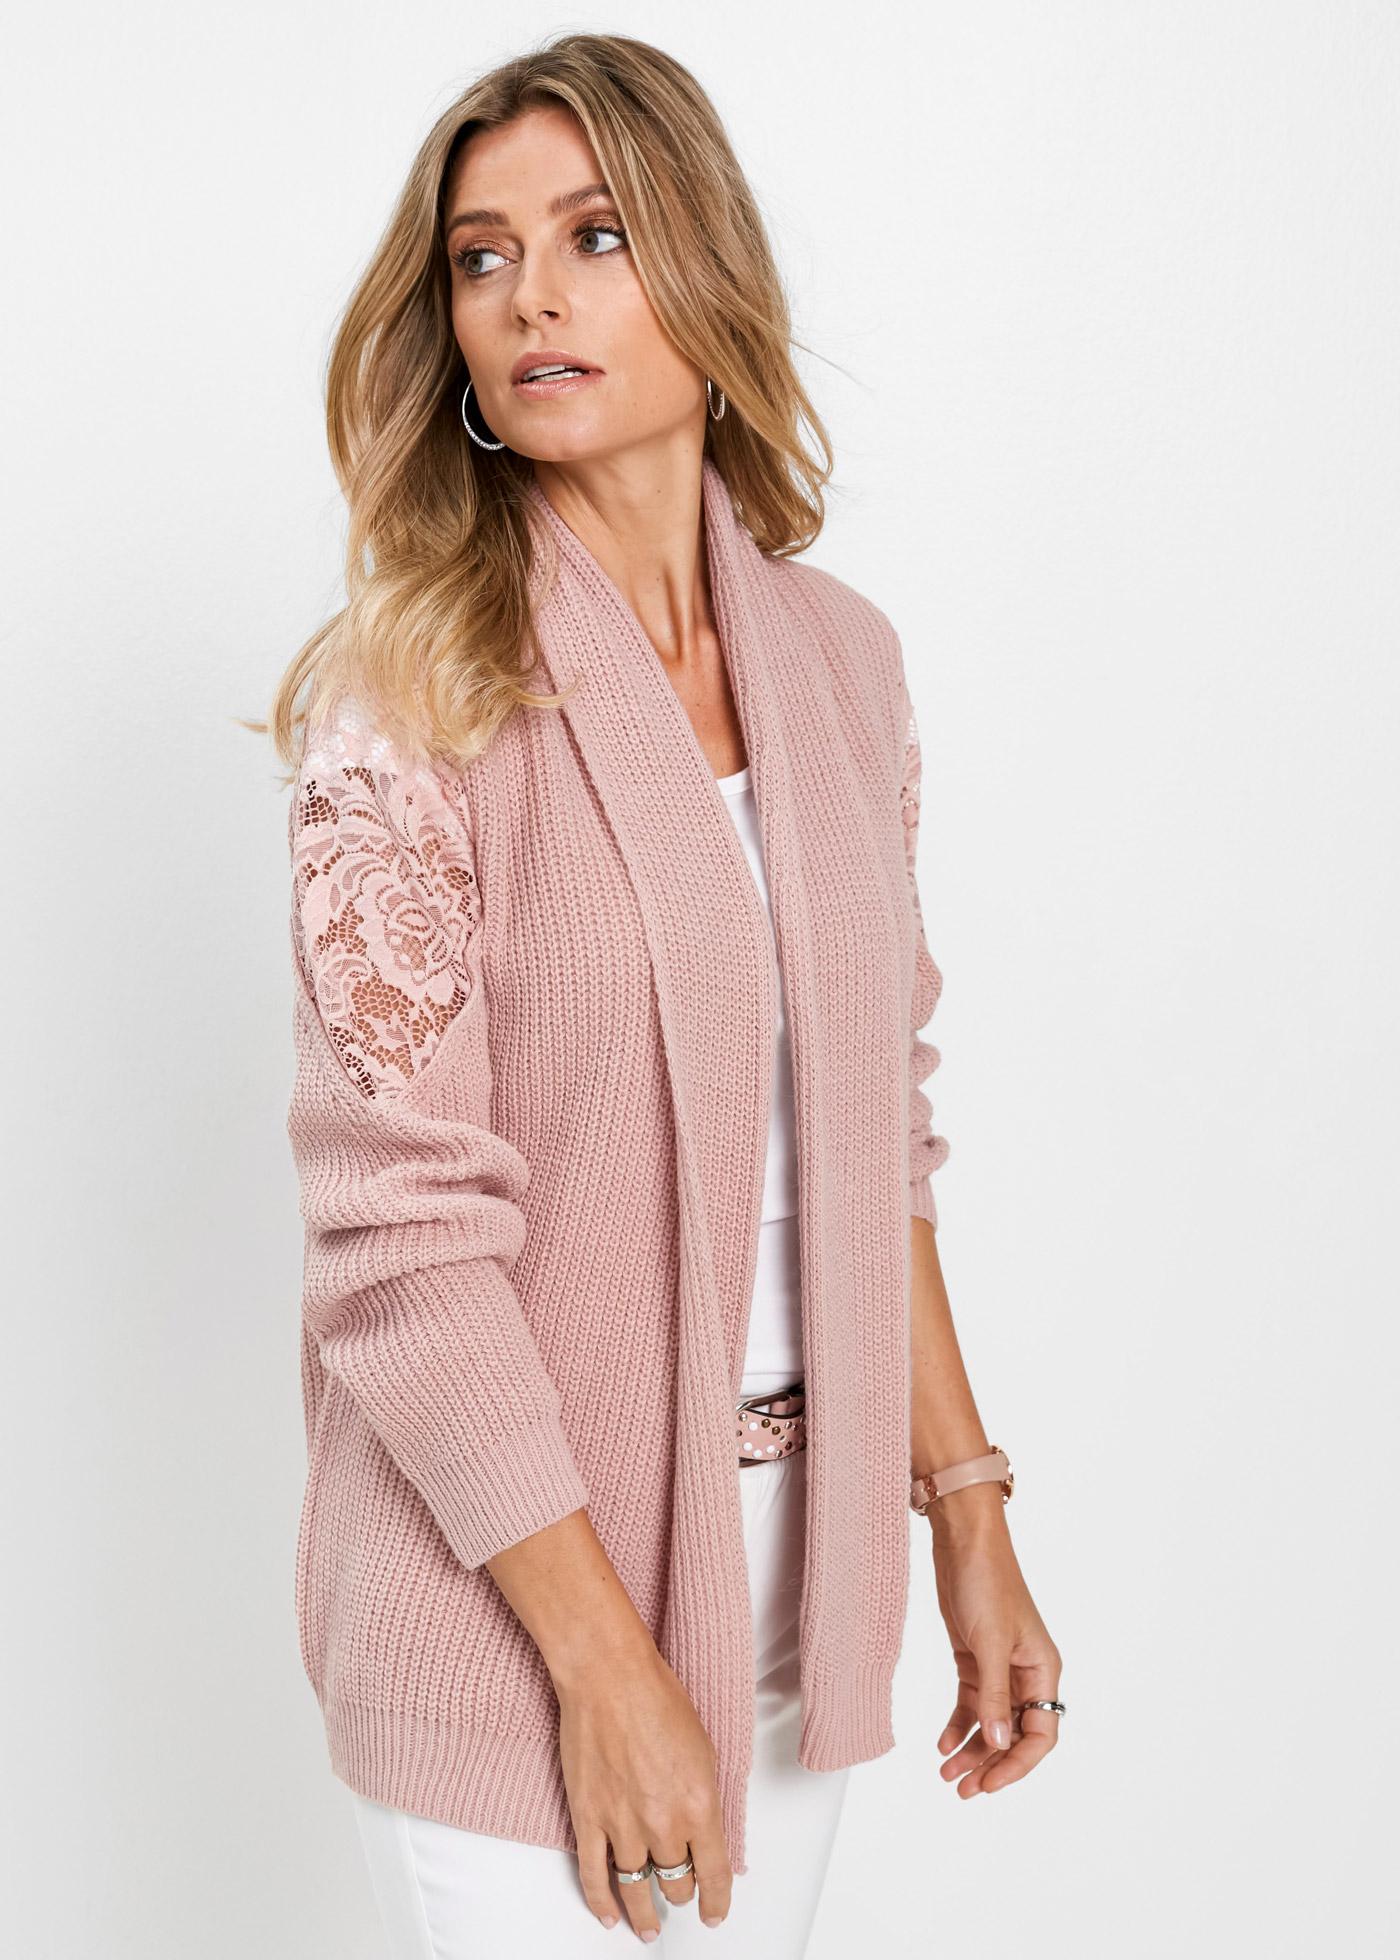 Pletený kabátek s krajkou - Růžová